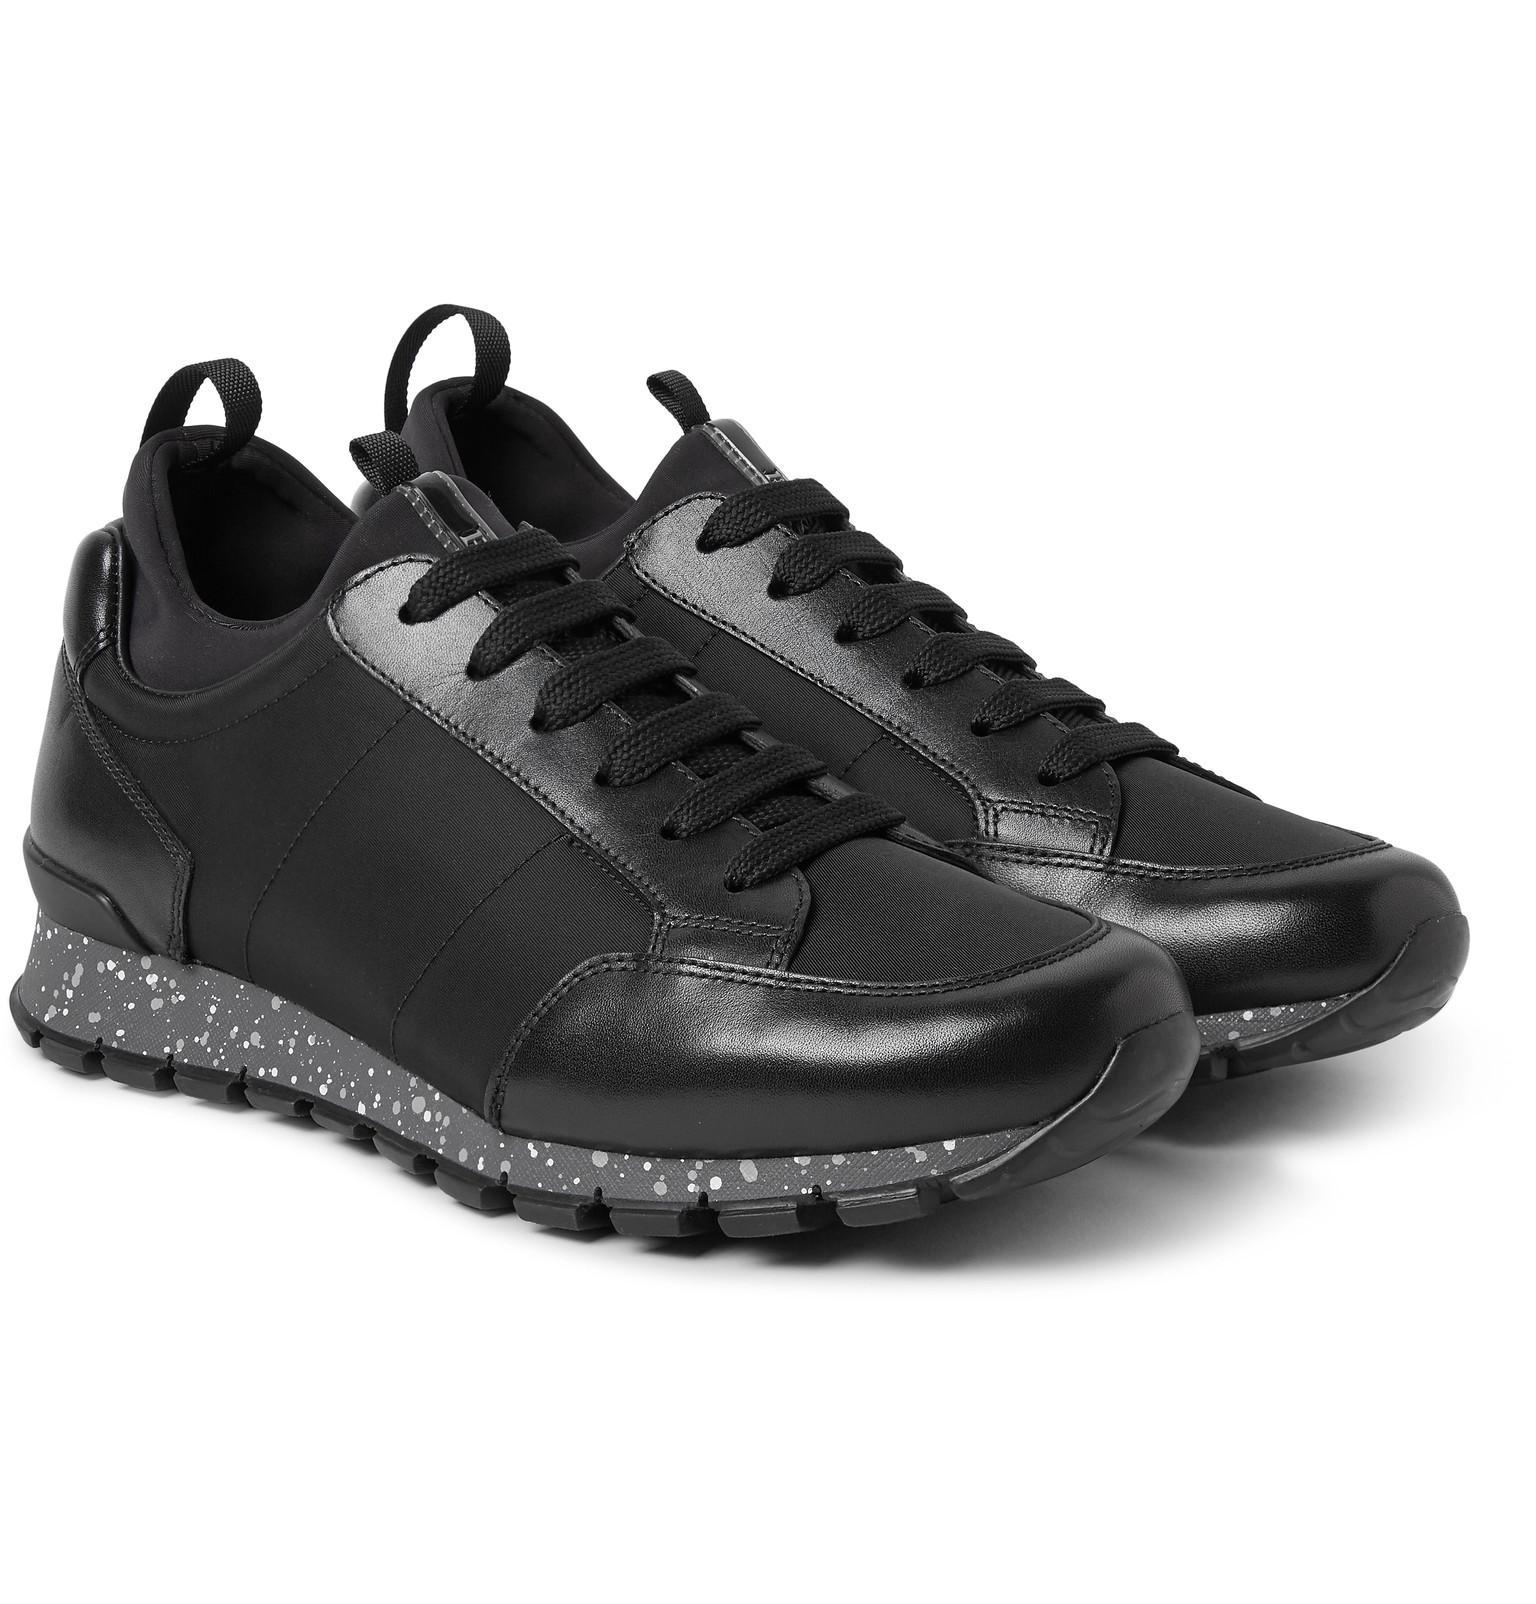 Lyst - Prada Sneaker in Black for Men